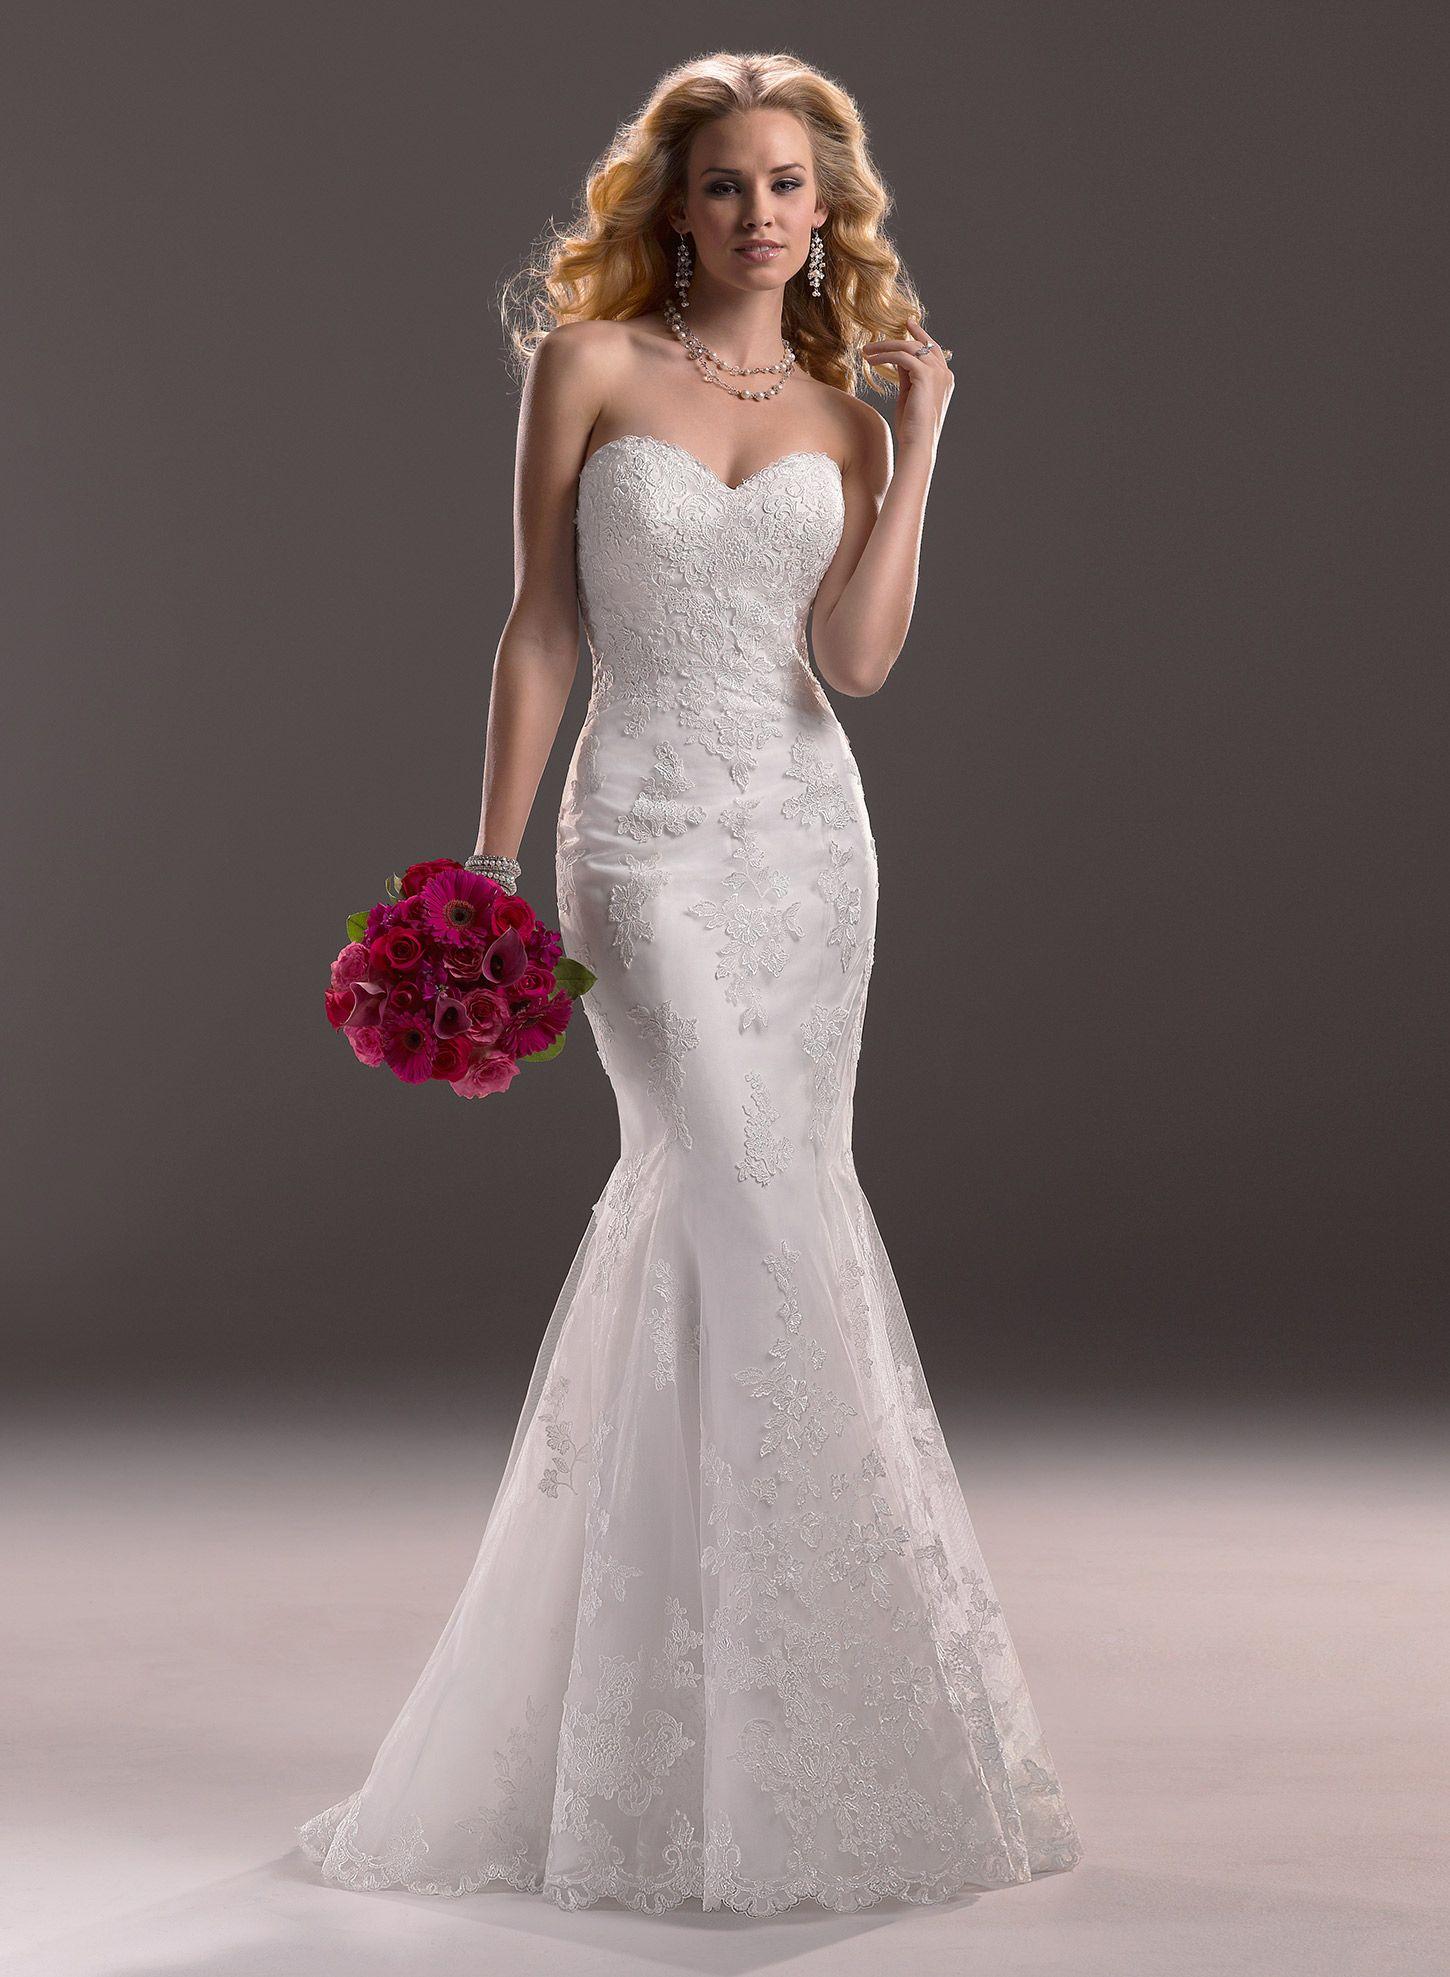 Bridal Collections Spokane Wa Wedding Dress Styles Wedding Bridesmaid Dresses Wedding Dresses